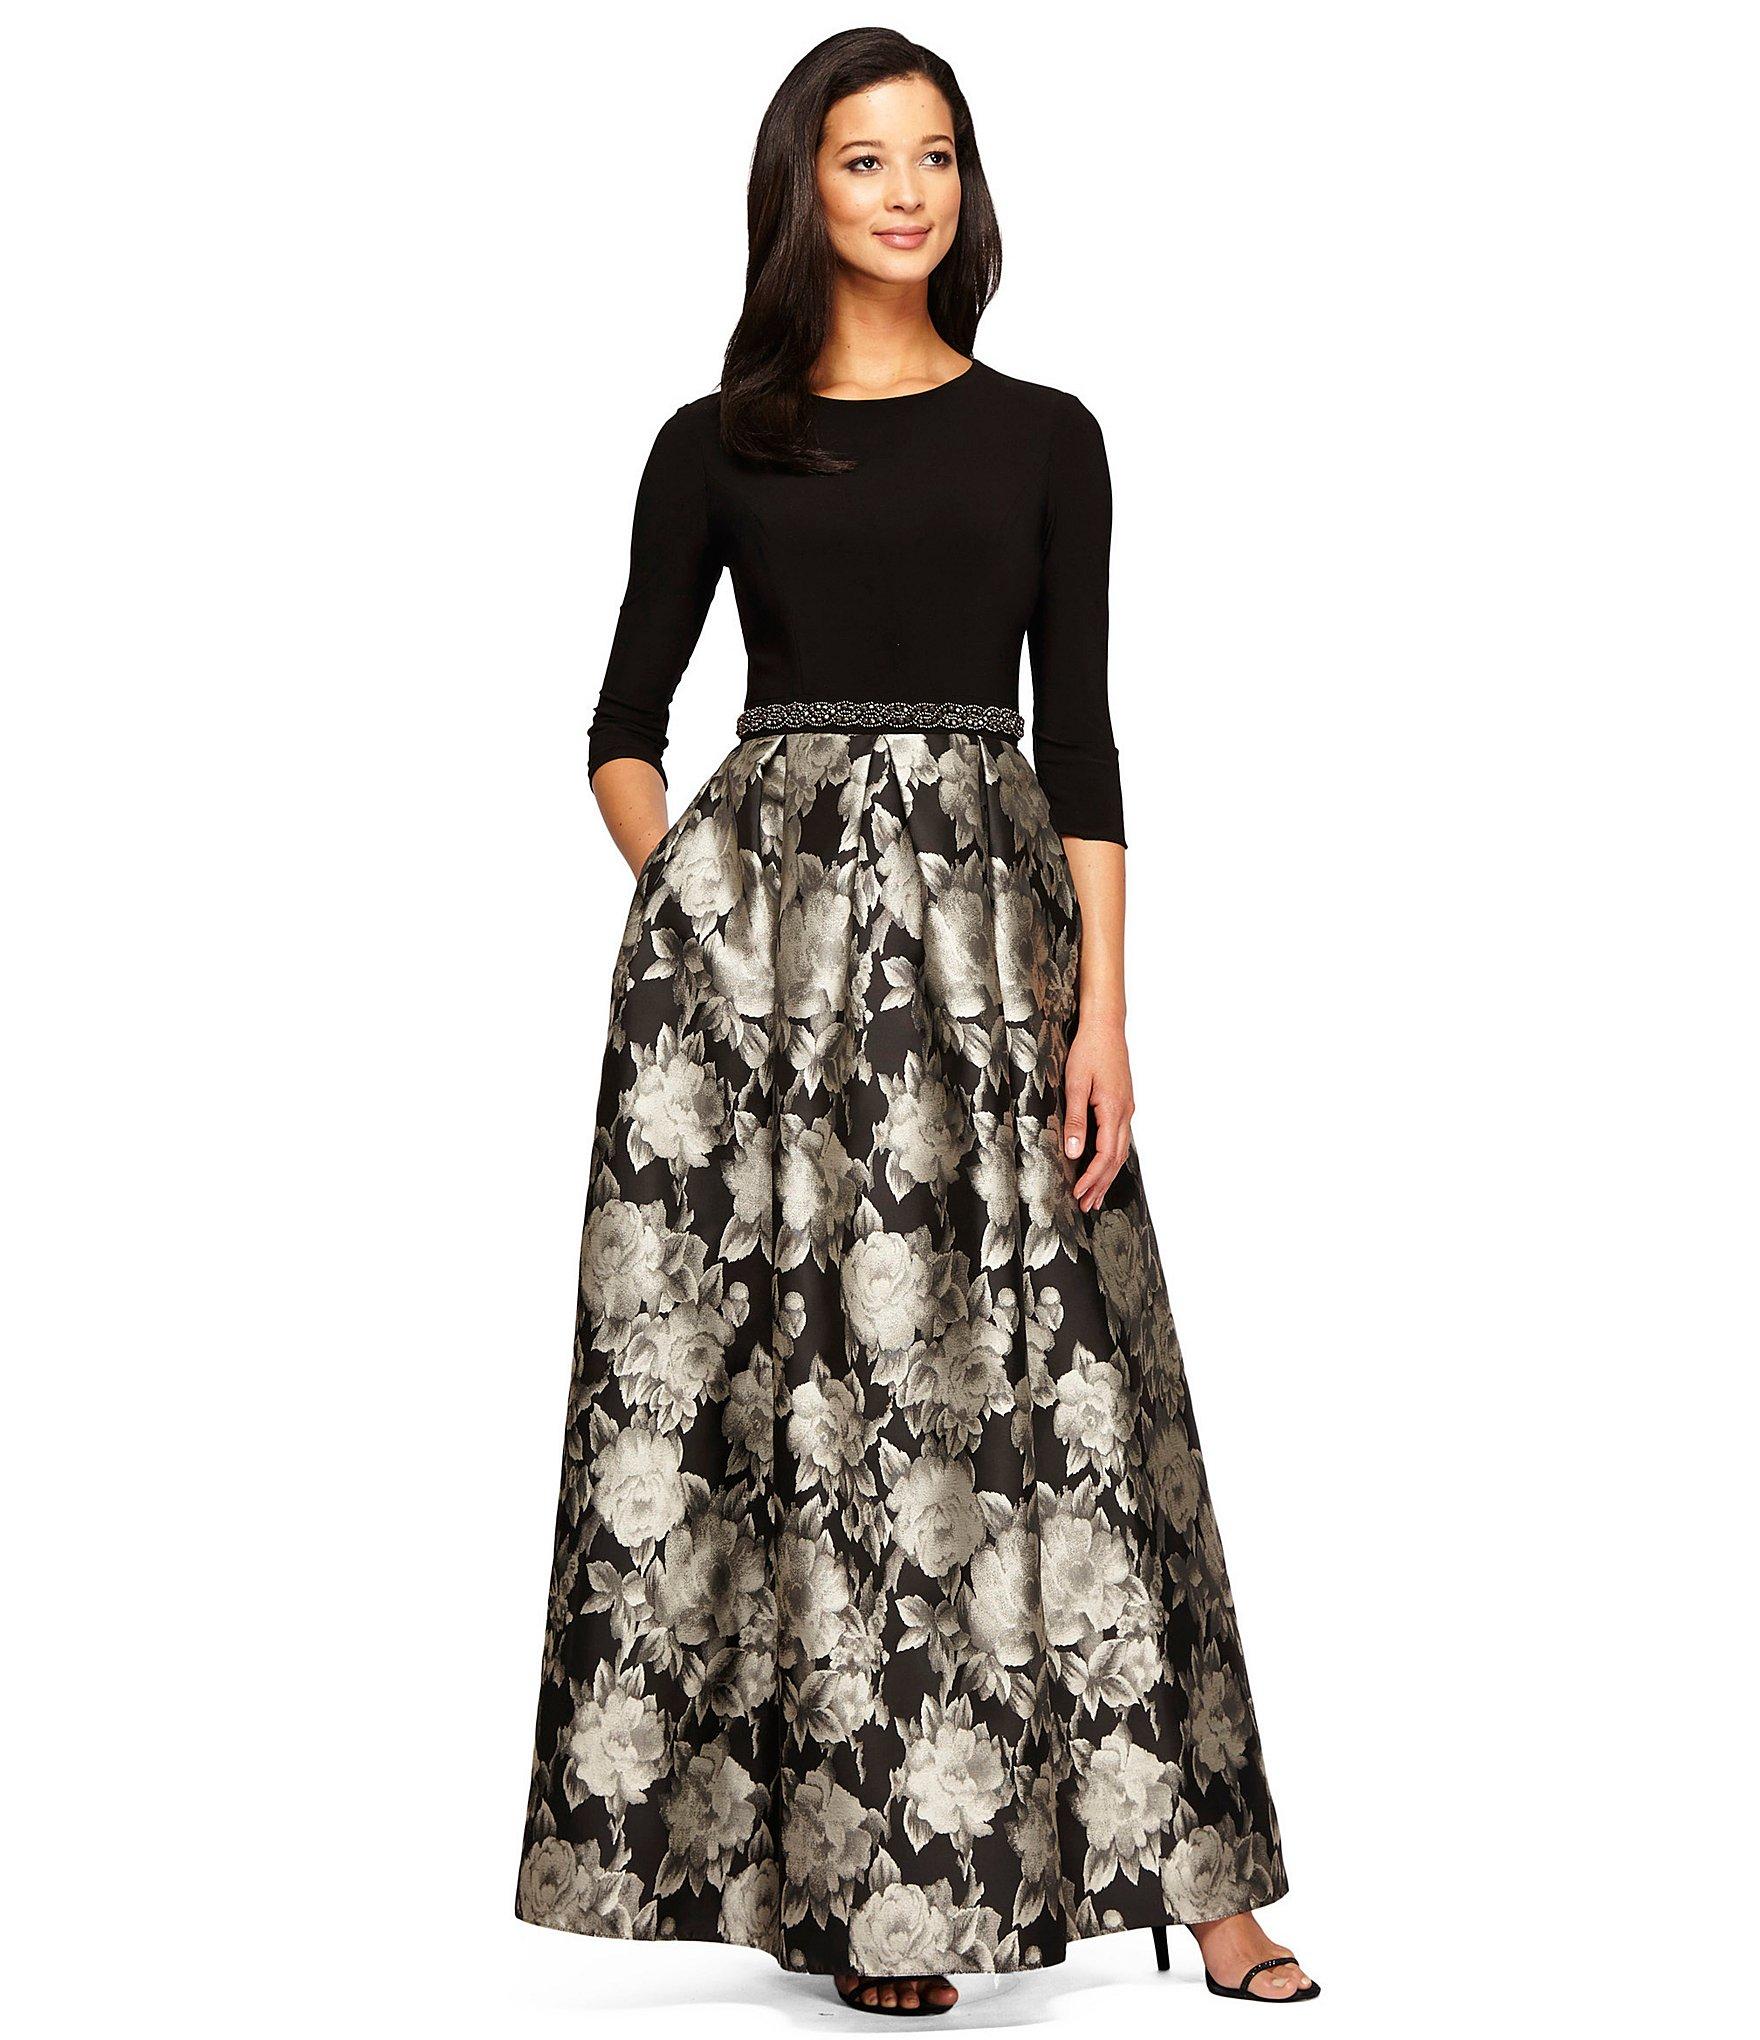 Lyst - Alex Evenings 3/4 Sleeve Beaded Waist Floral Ballgown in Black